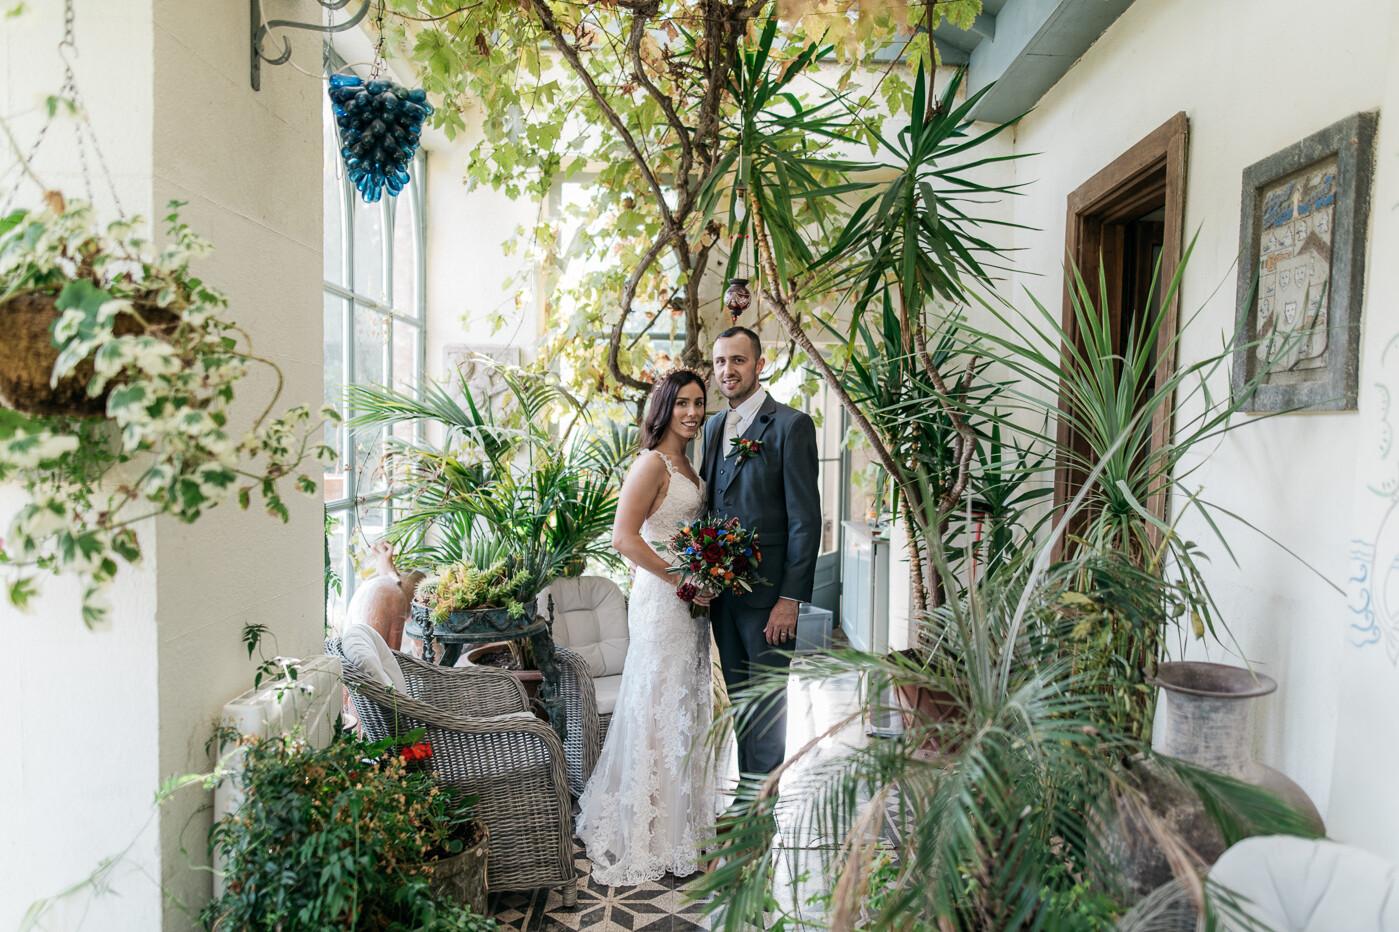 Best Wedding Photographers Ireland 08 07 2021 22